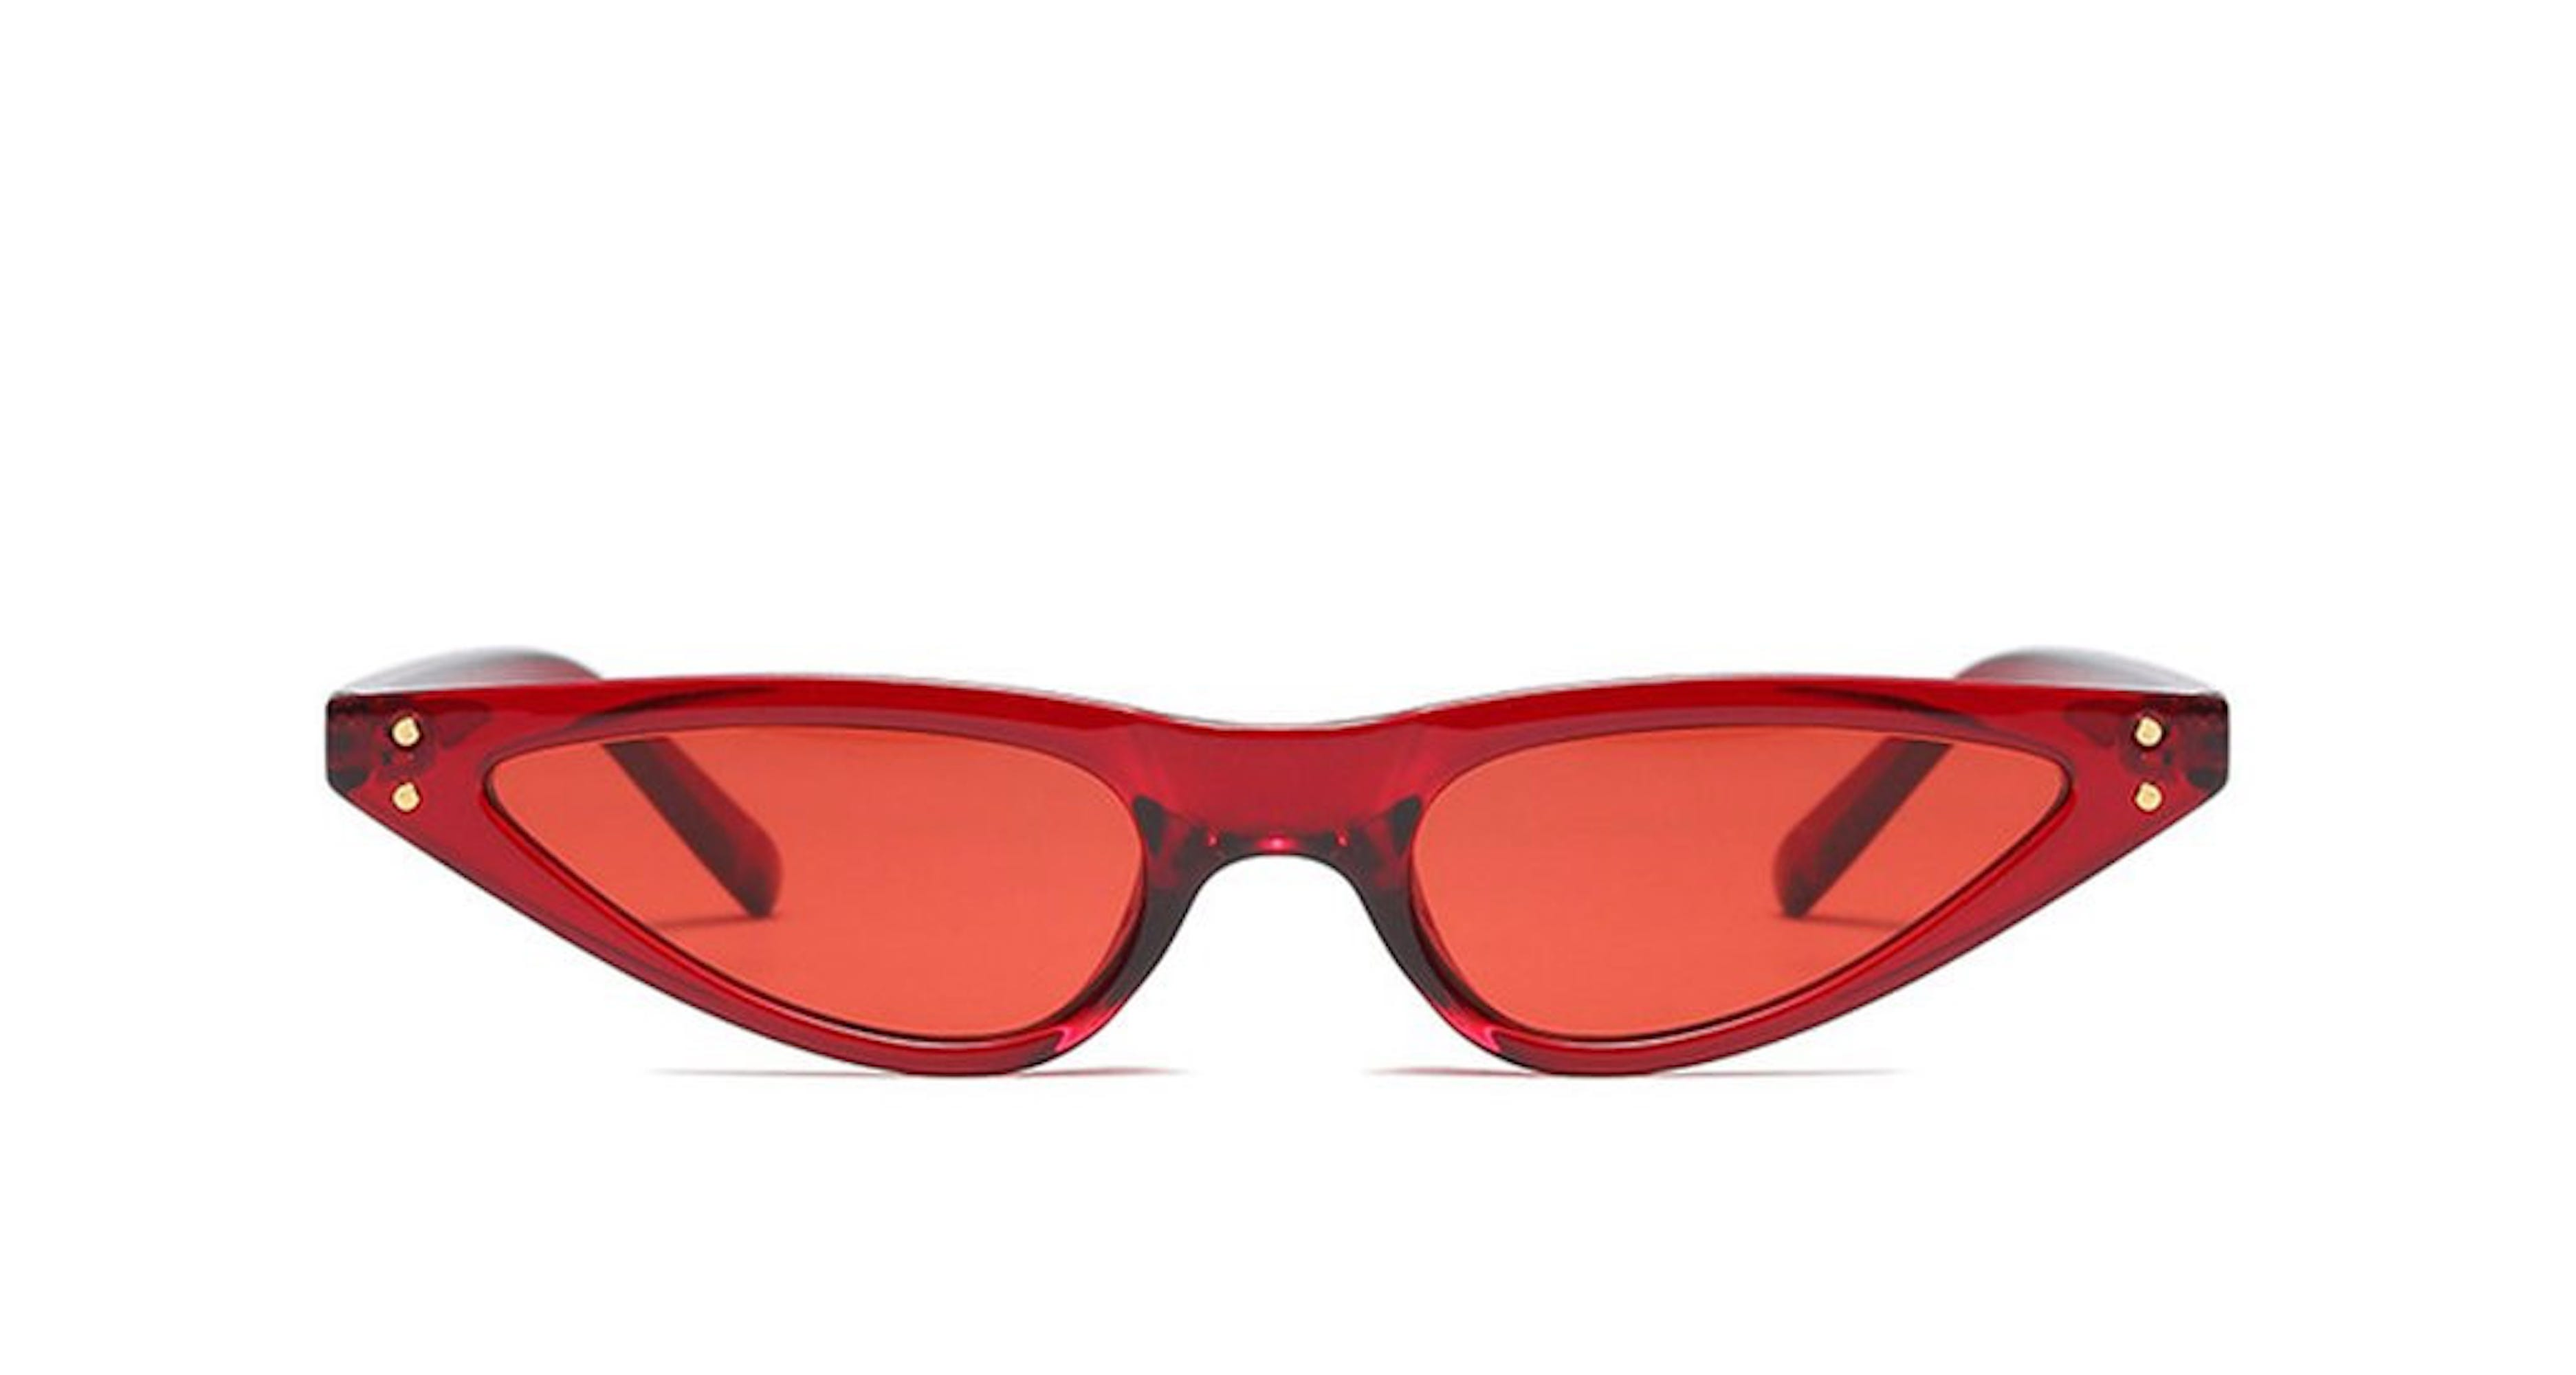 756a982fa6 Matrix Sunglasses - Where To Buy Skinny Shades